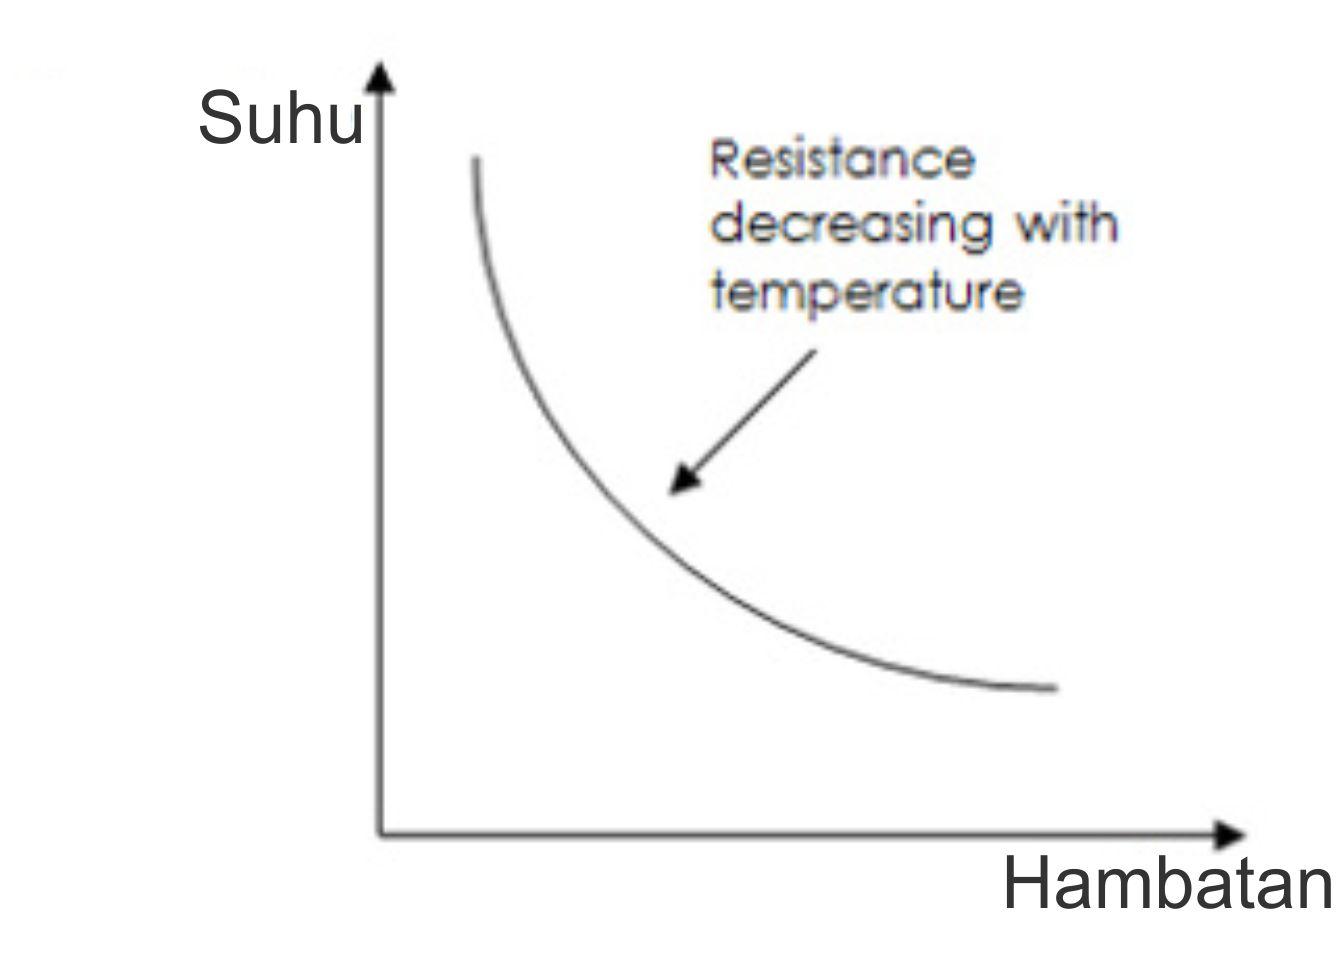 cara kerja thermistor